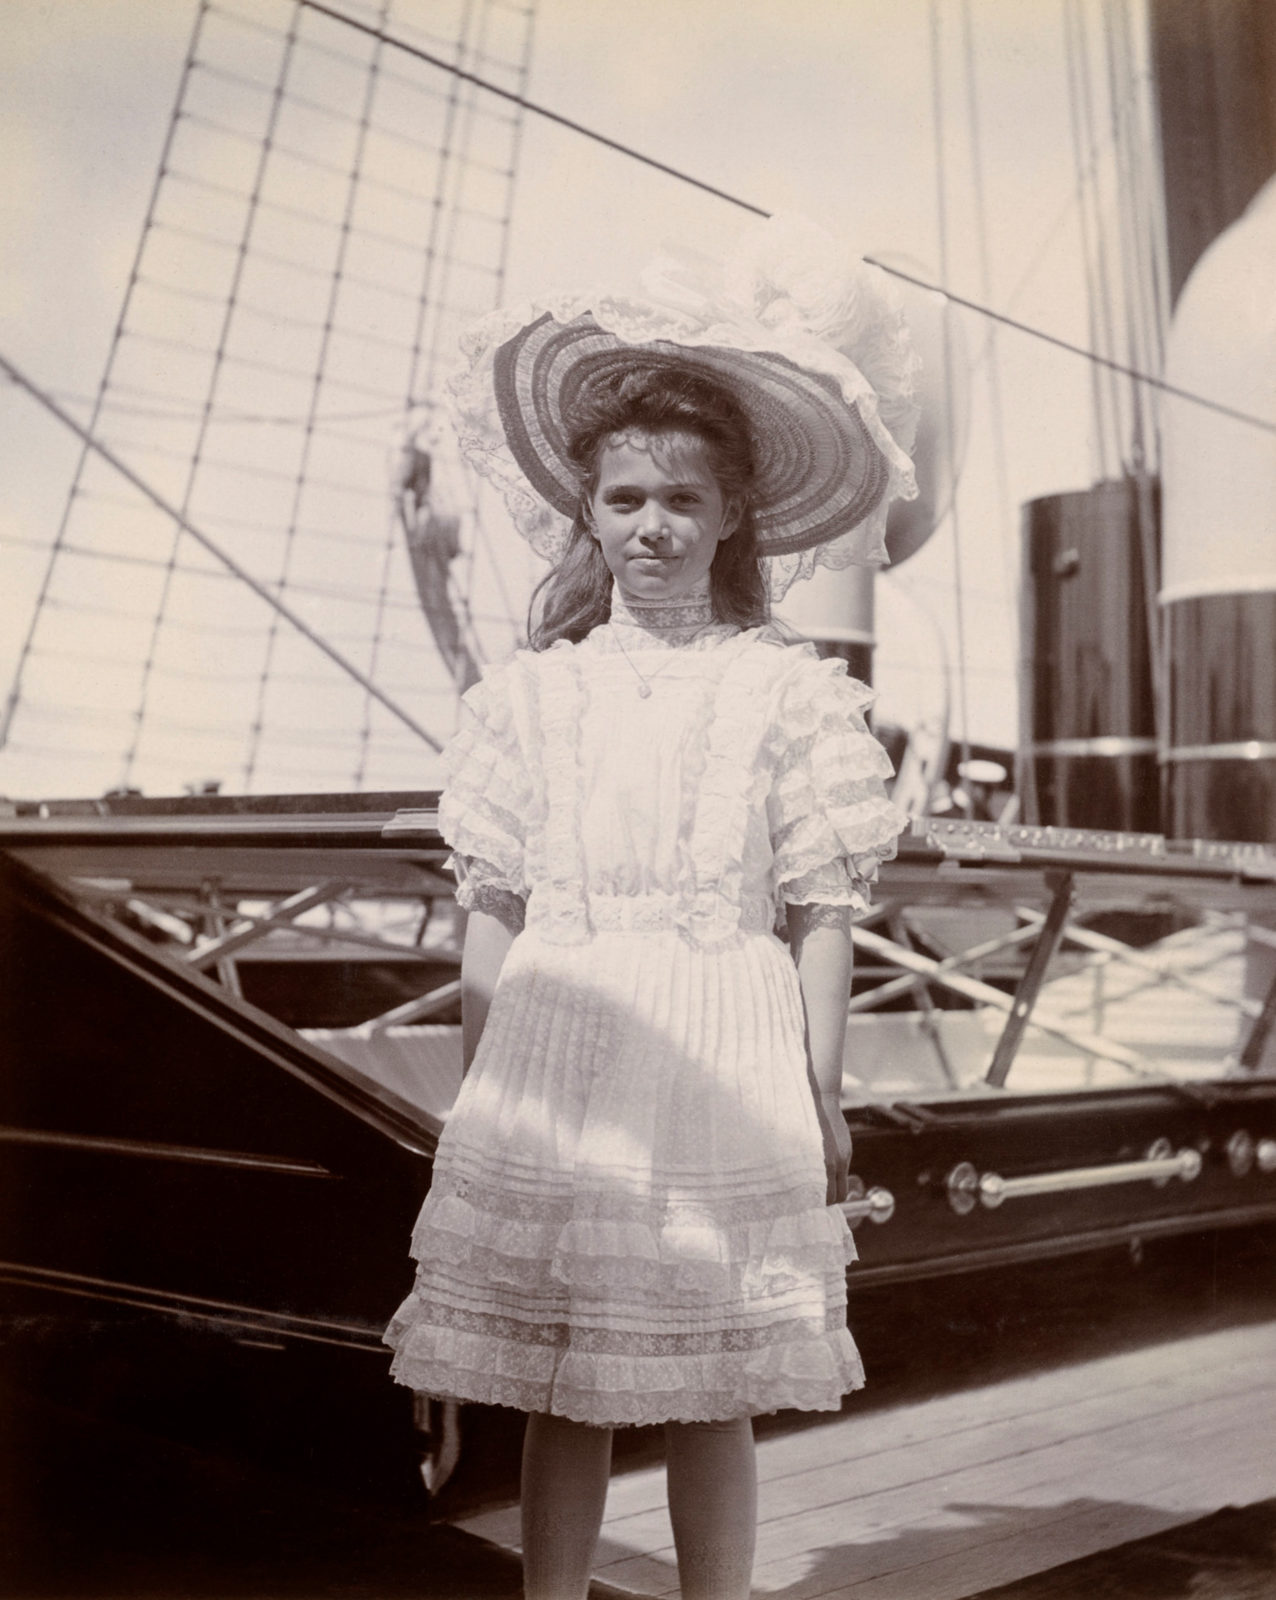 Grand Duchess Maria Nikolaevna. The third daughter of Emperor Nicholas II and Empress Alexandra Feodorovna. On the ship. Photo of 1908.